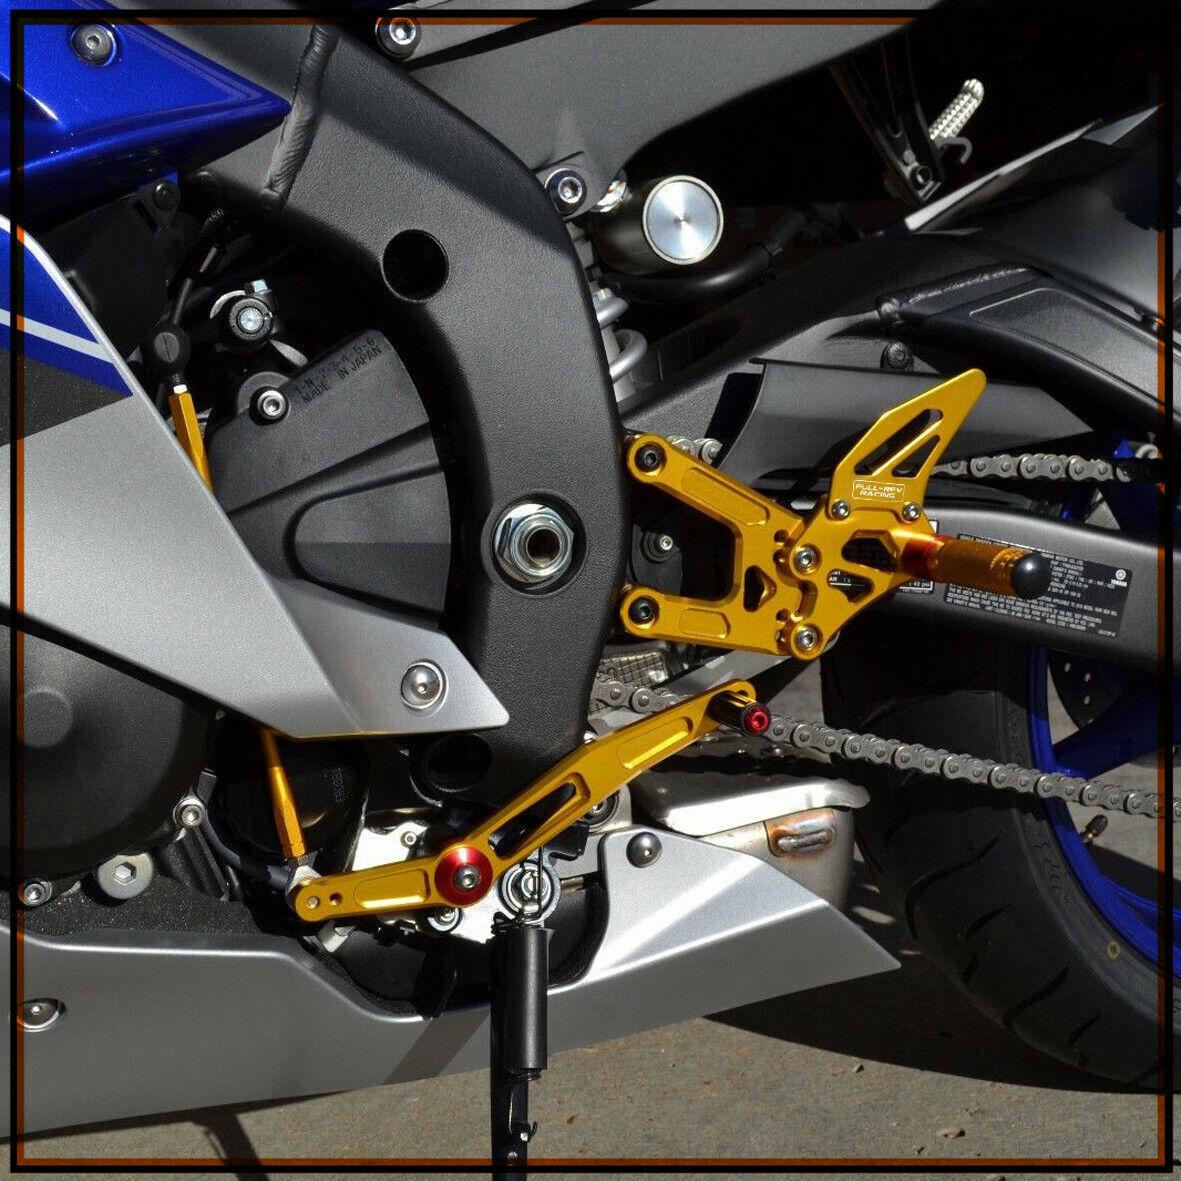 /2009/2010/2011/2012/nuovo Moto nero posteriore passeggero pedane per Yamaha YZF R6/2006/